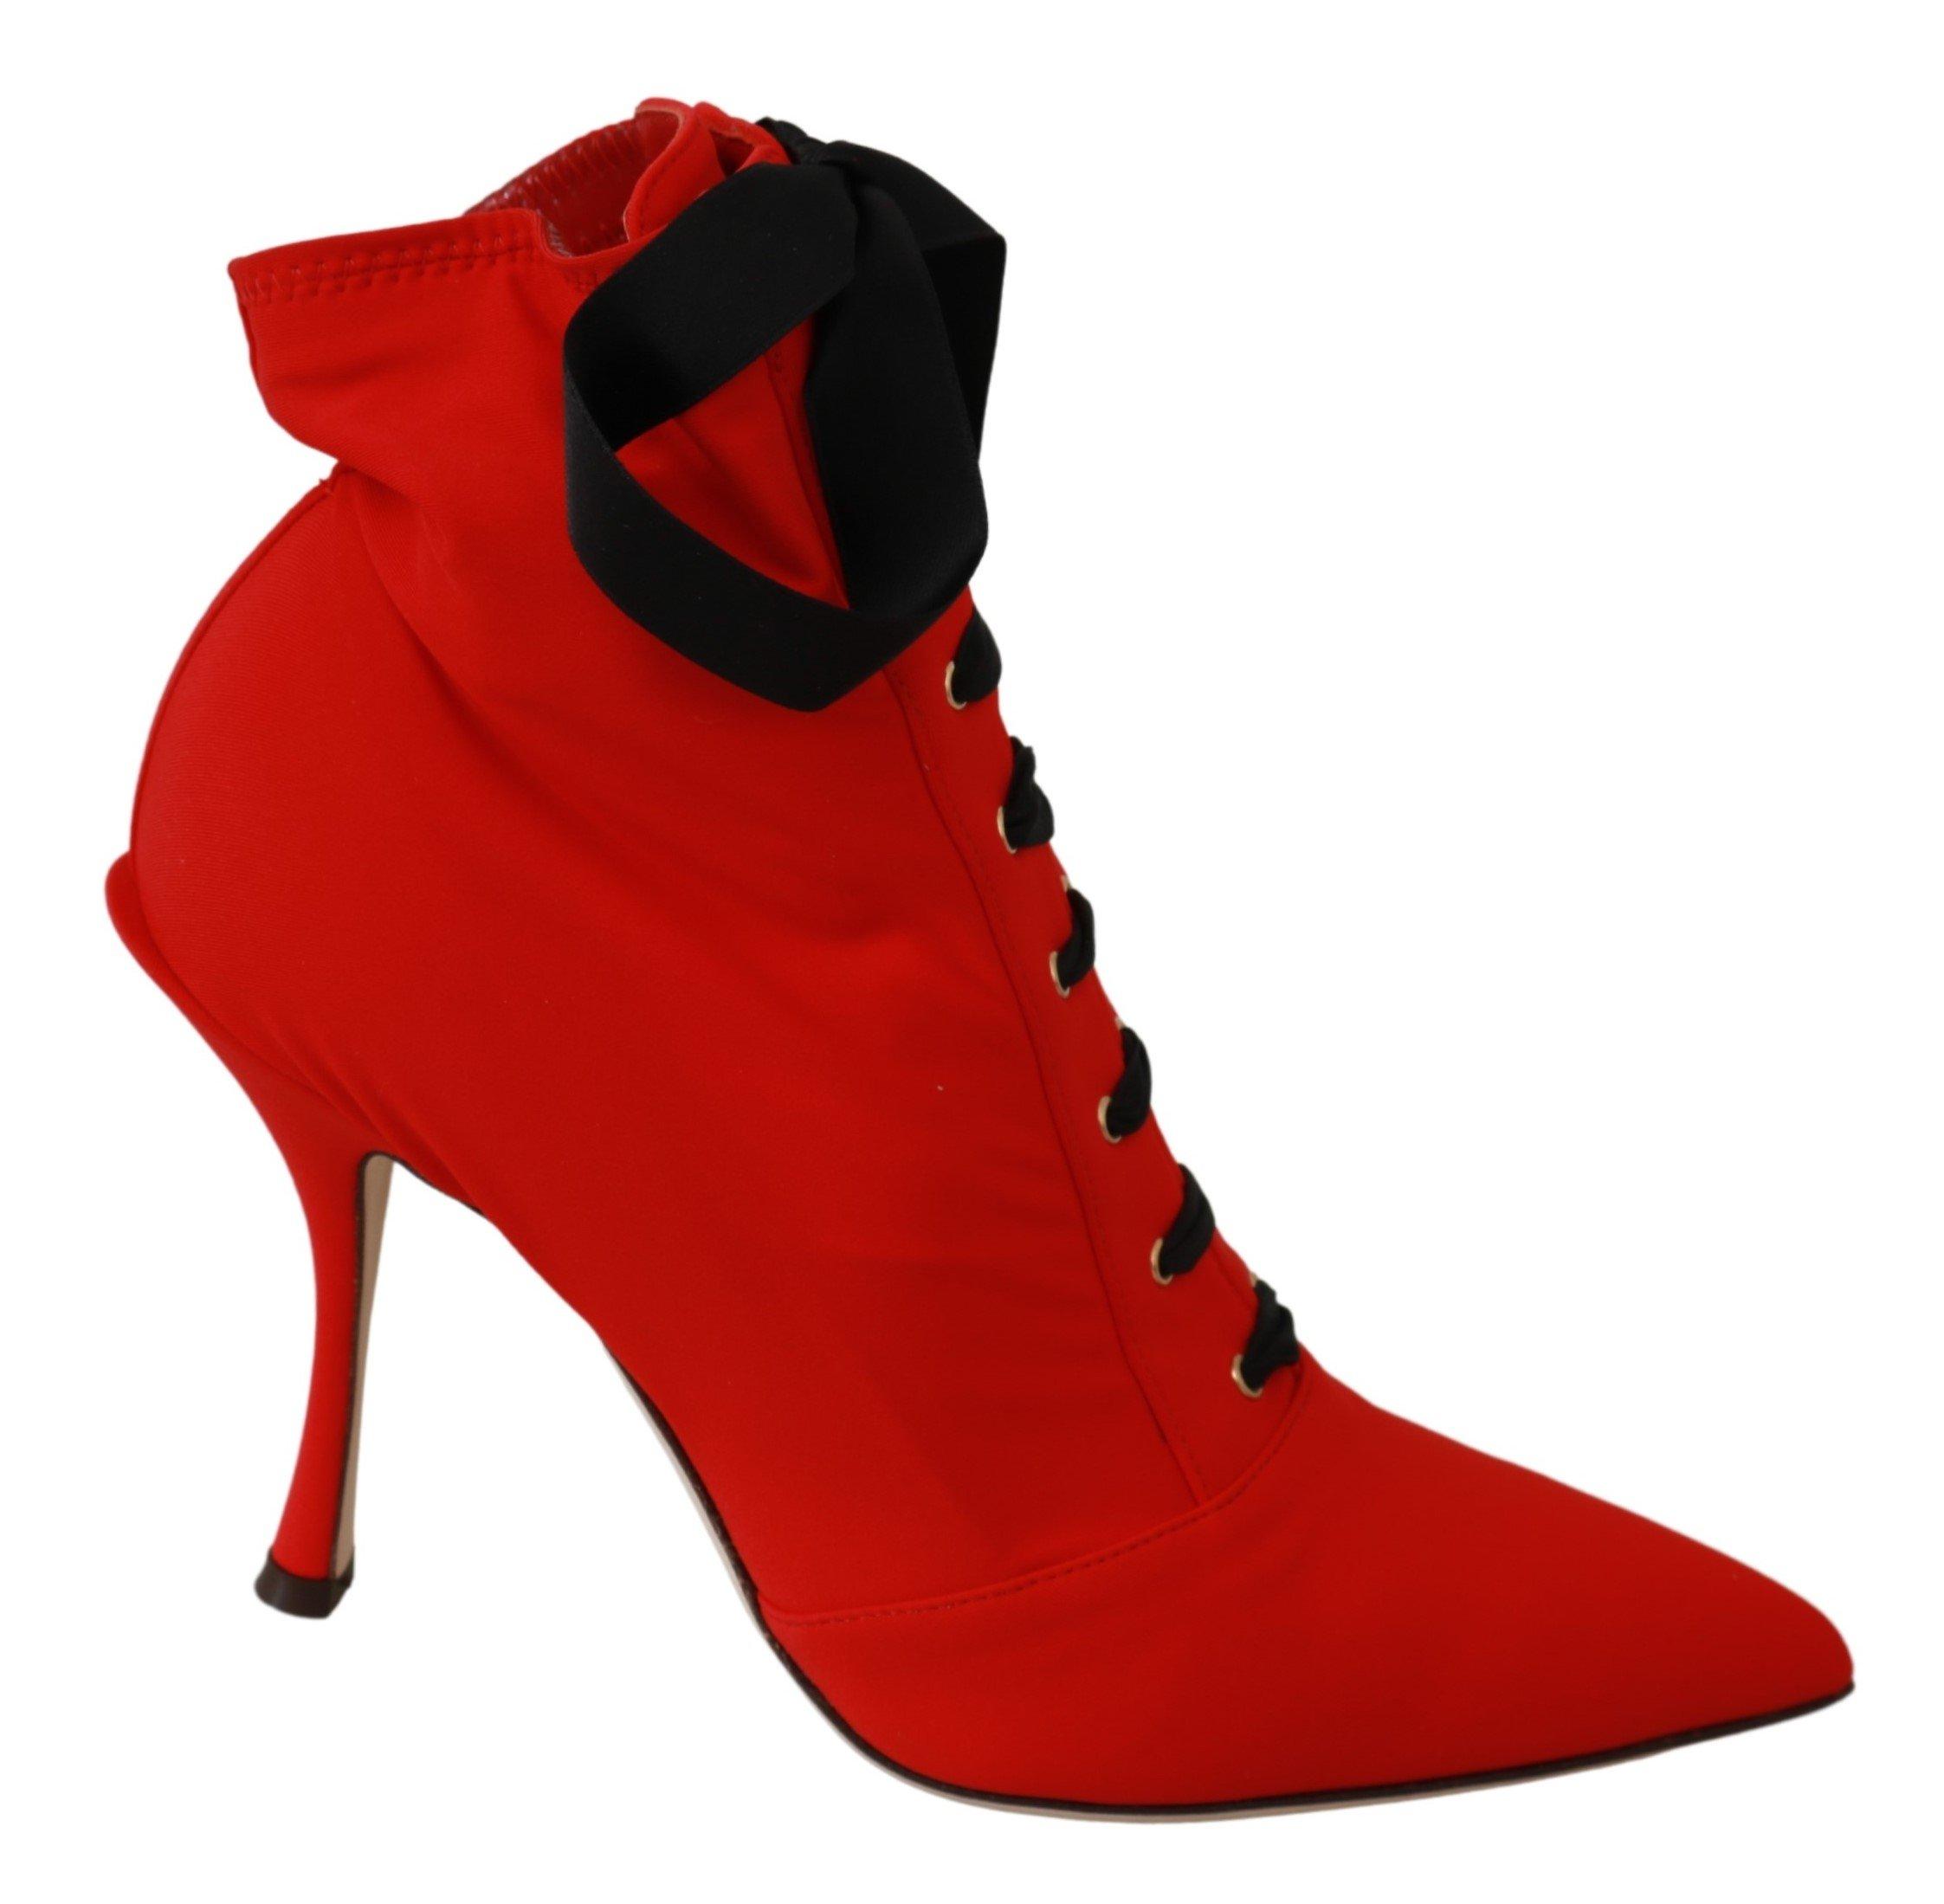 Dolce & Gabbana Women's Stretch Soft Heels Shoes Red LA6495 - EU36/US5.5